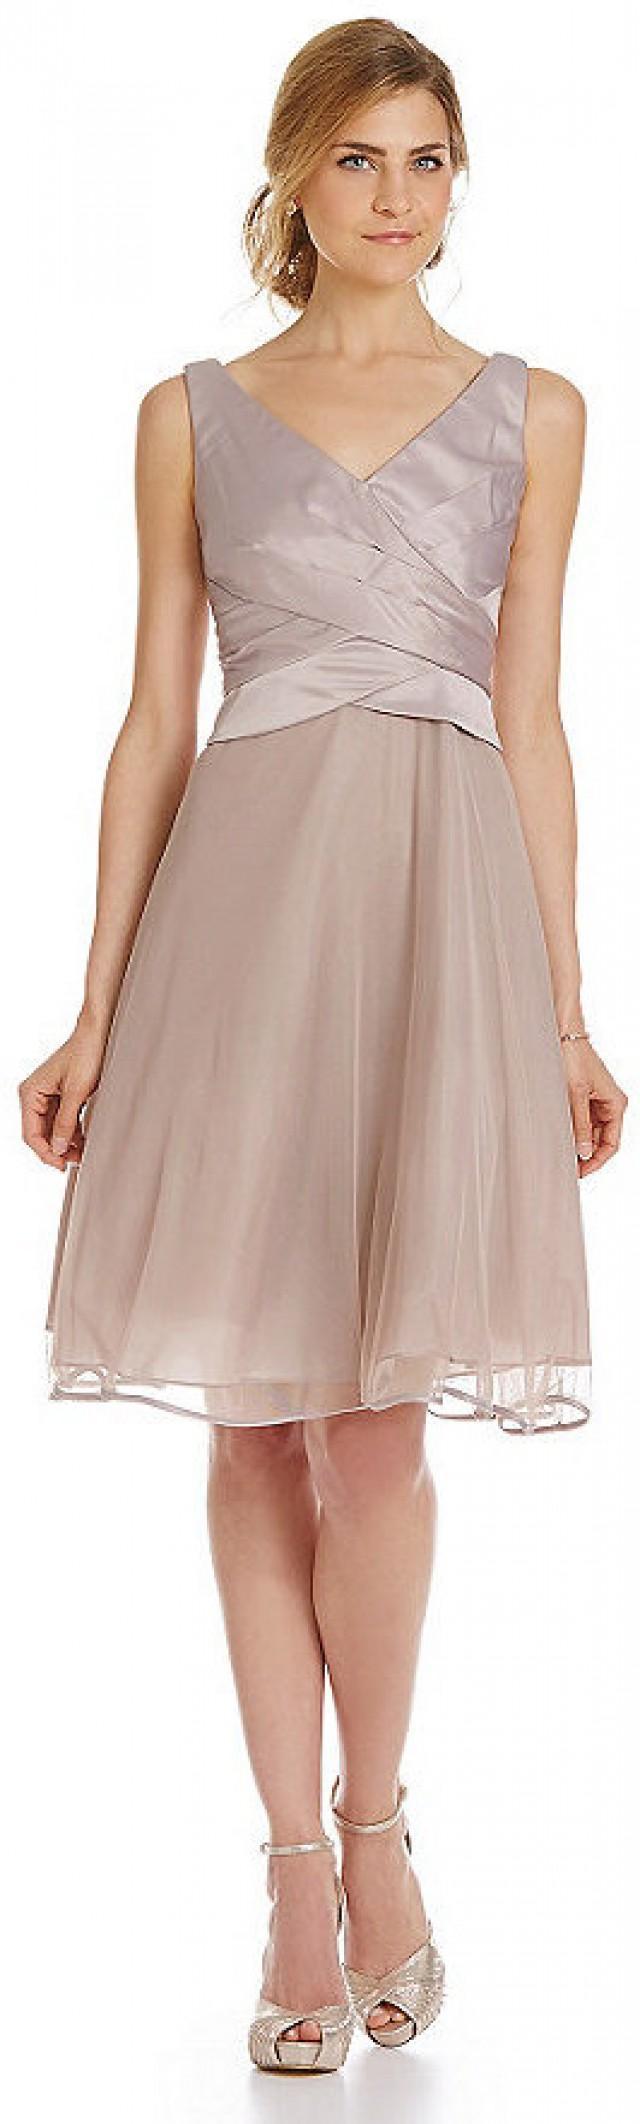 Sl sl fashion dresses - Sl Sl Fashion Dresses 26